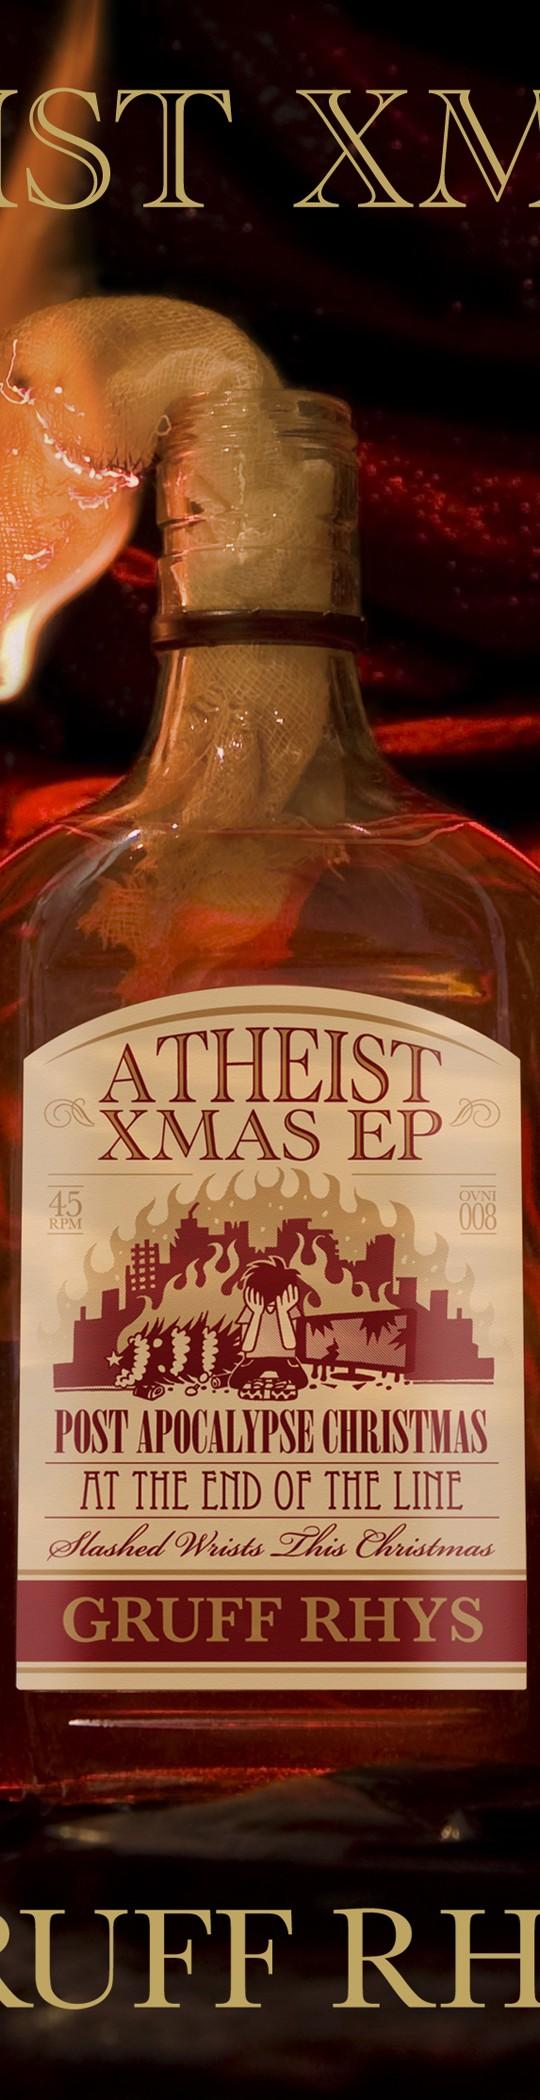 21. desember: Apocalypse Christmas – Gruff Rhys